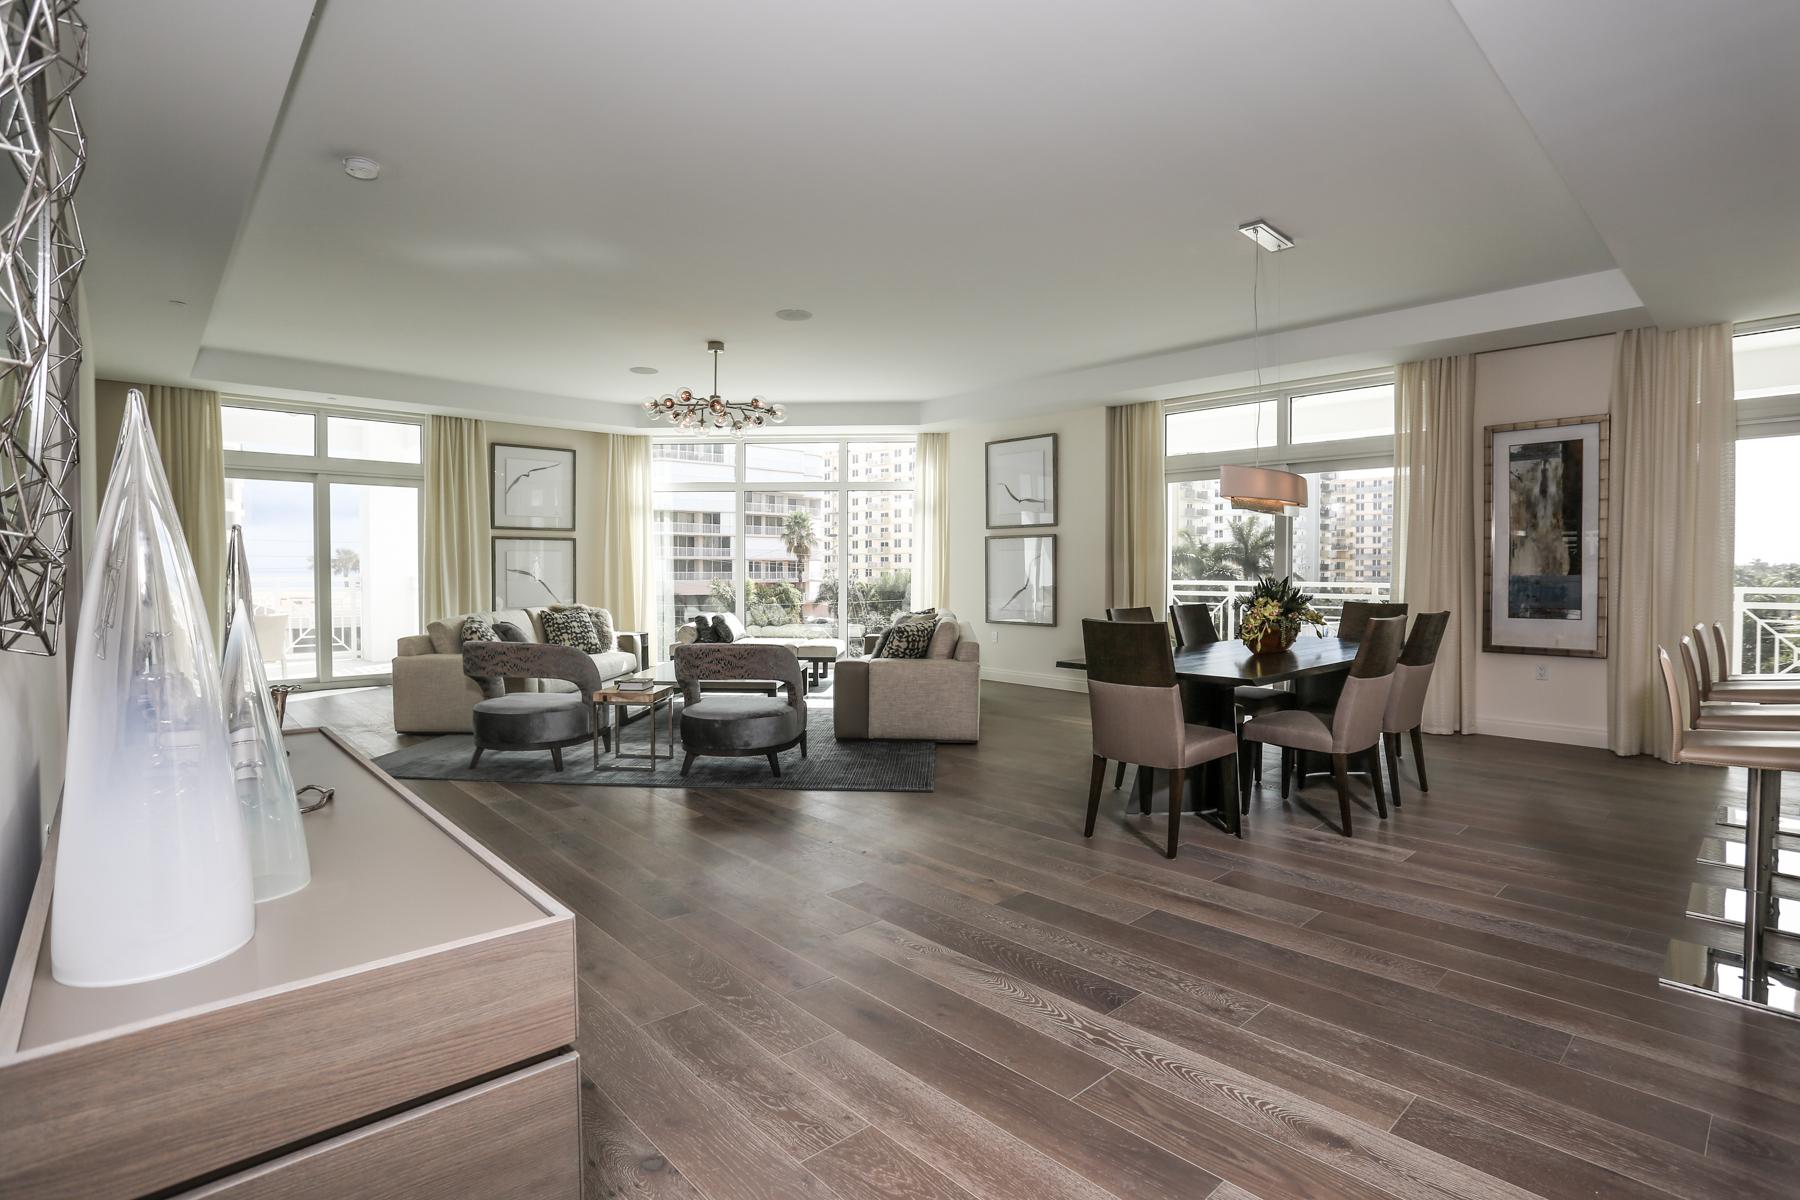 Custom Condominium | Highland Beach, FL  Architect | Kobi Karp  Interior Designer | Leighton Design Group   View Project